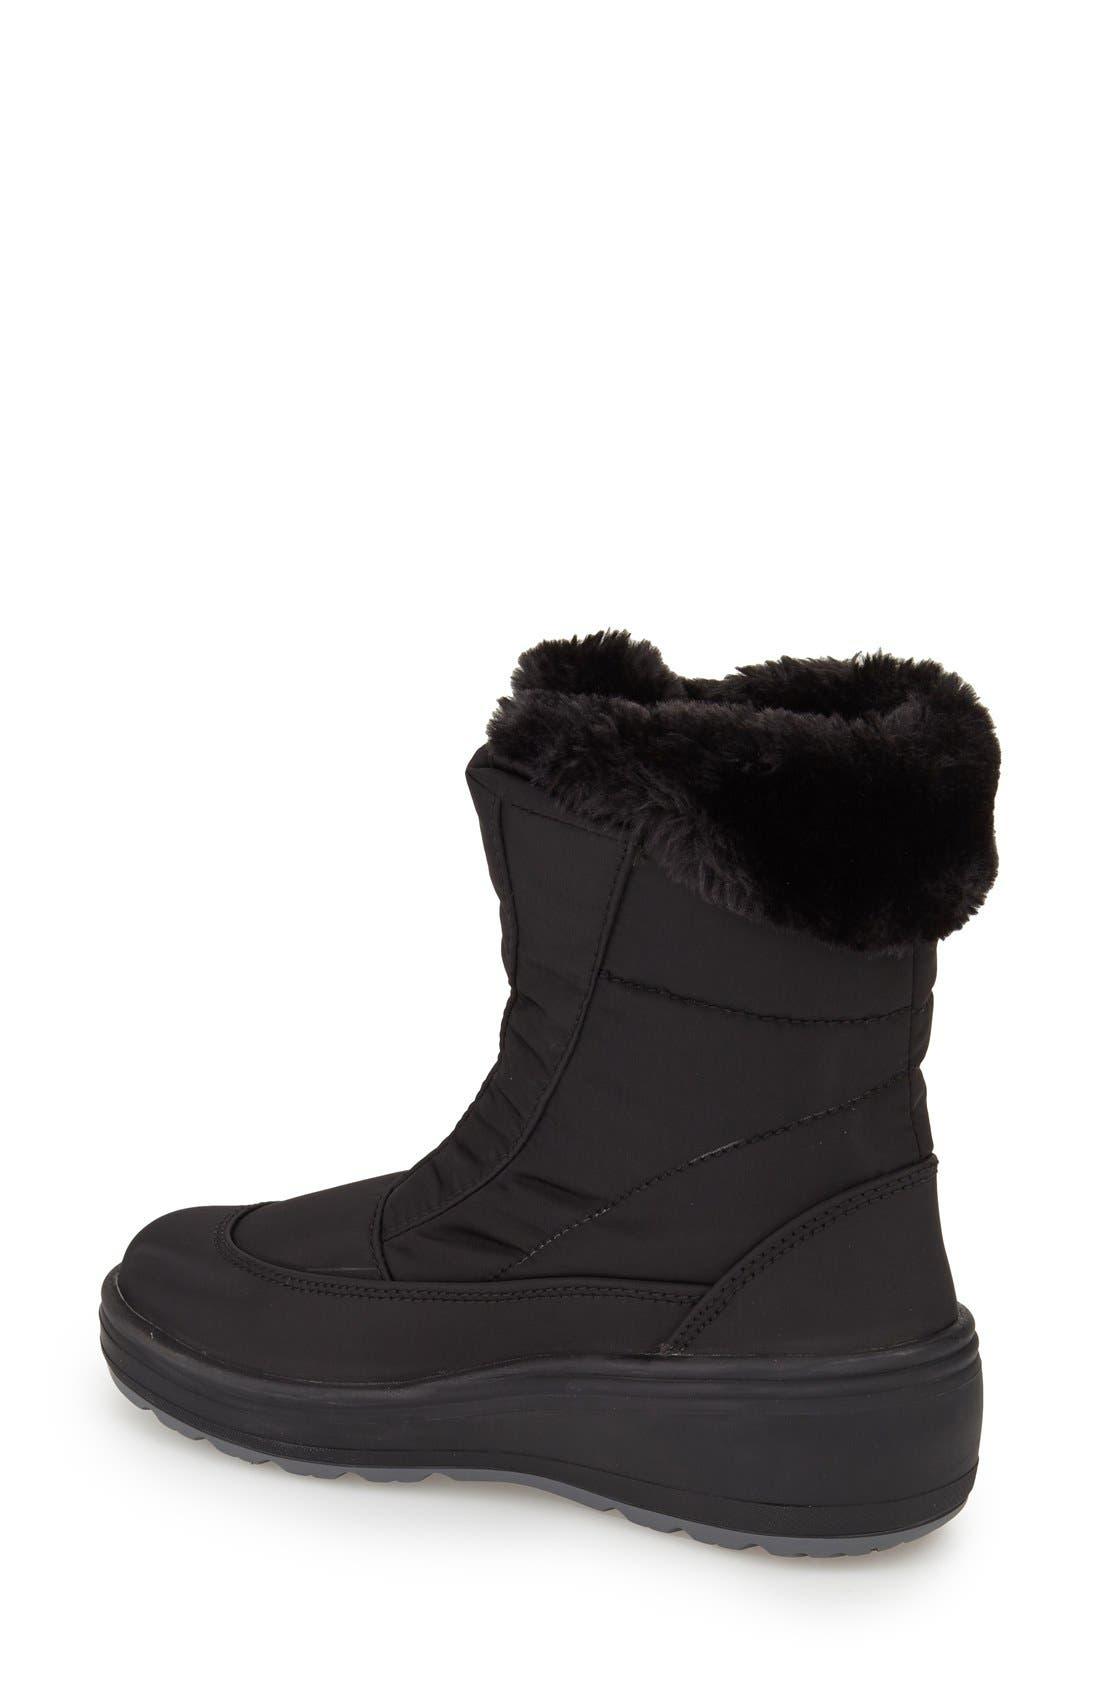 'Kimmi' Snow Boot,                             Alternate thumbnail 3, color,                             001